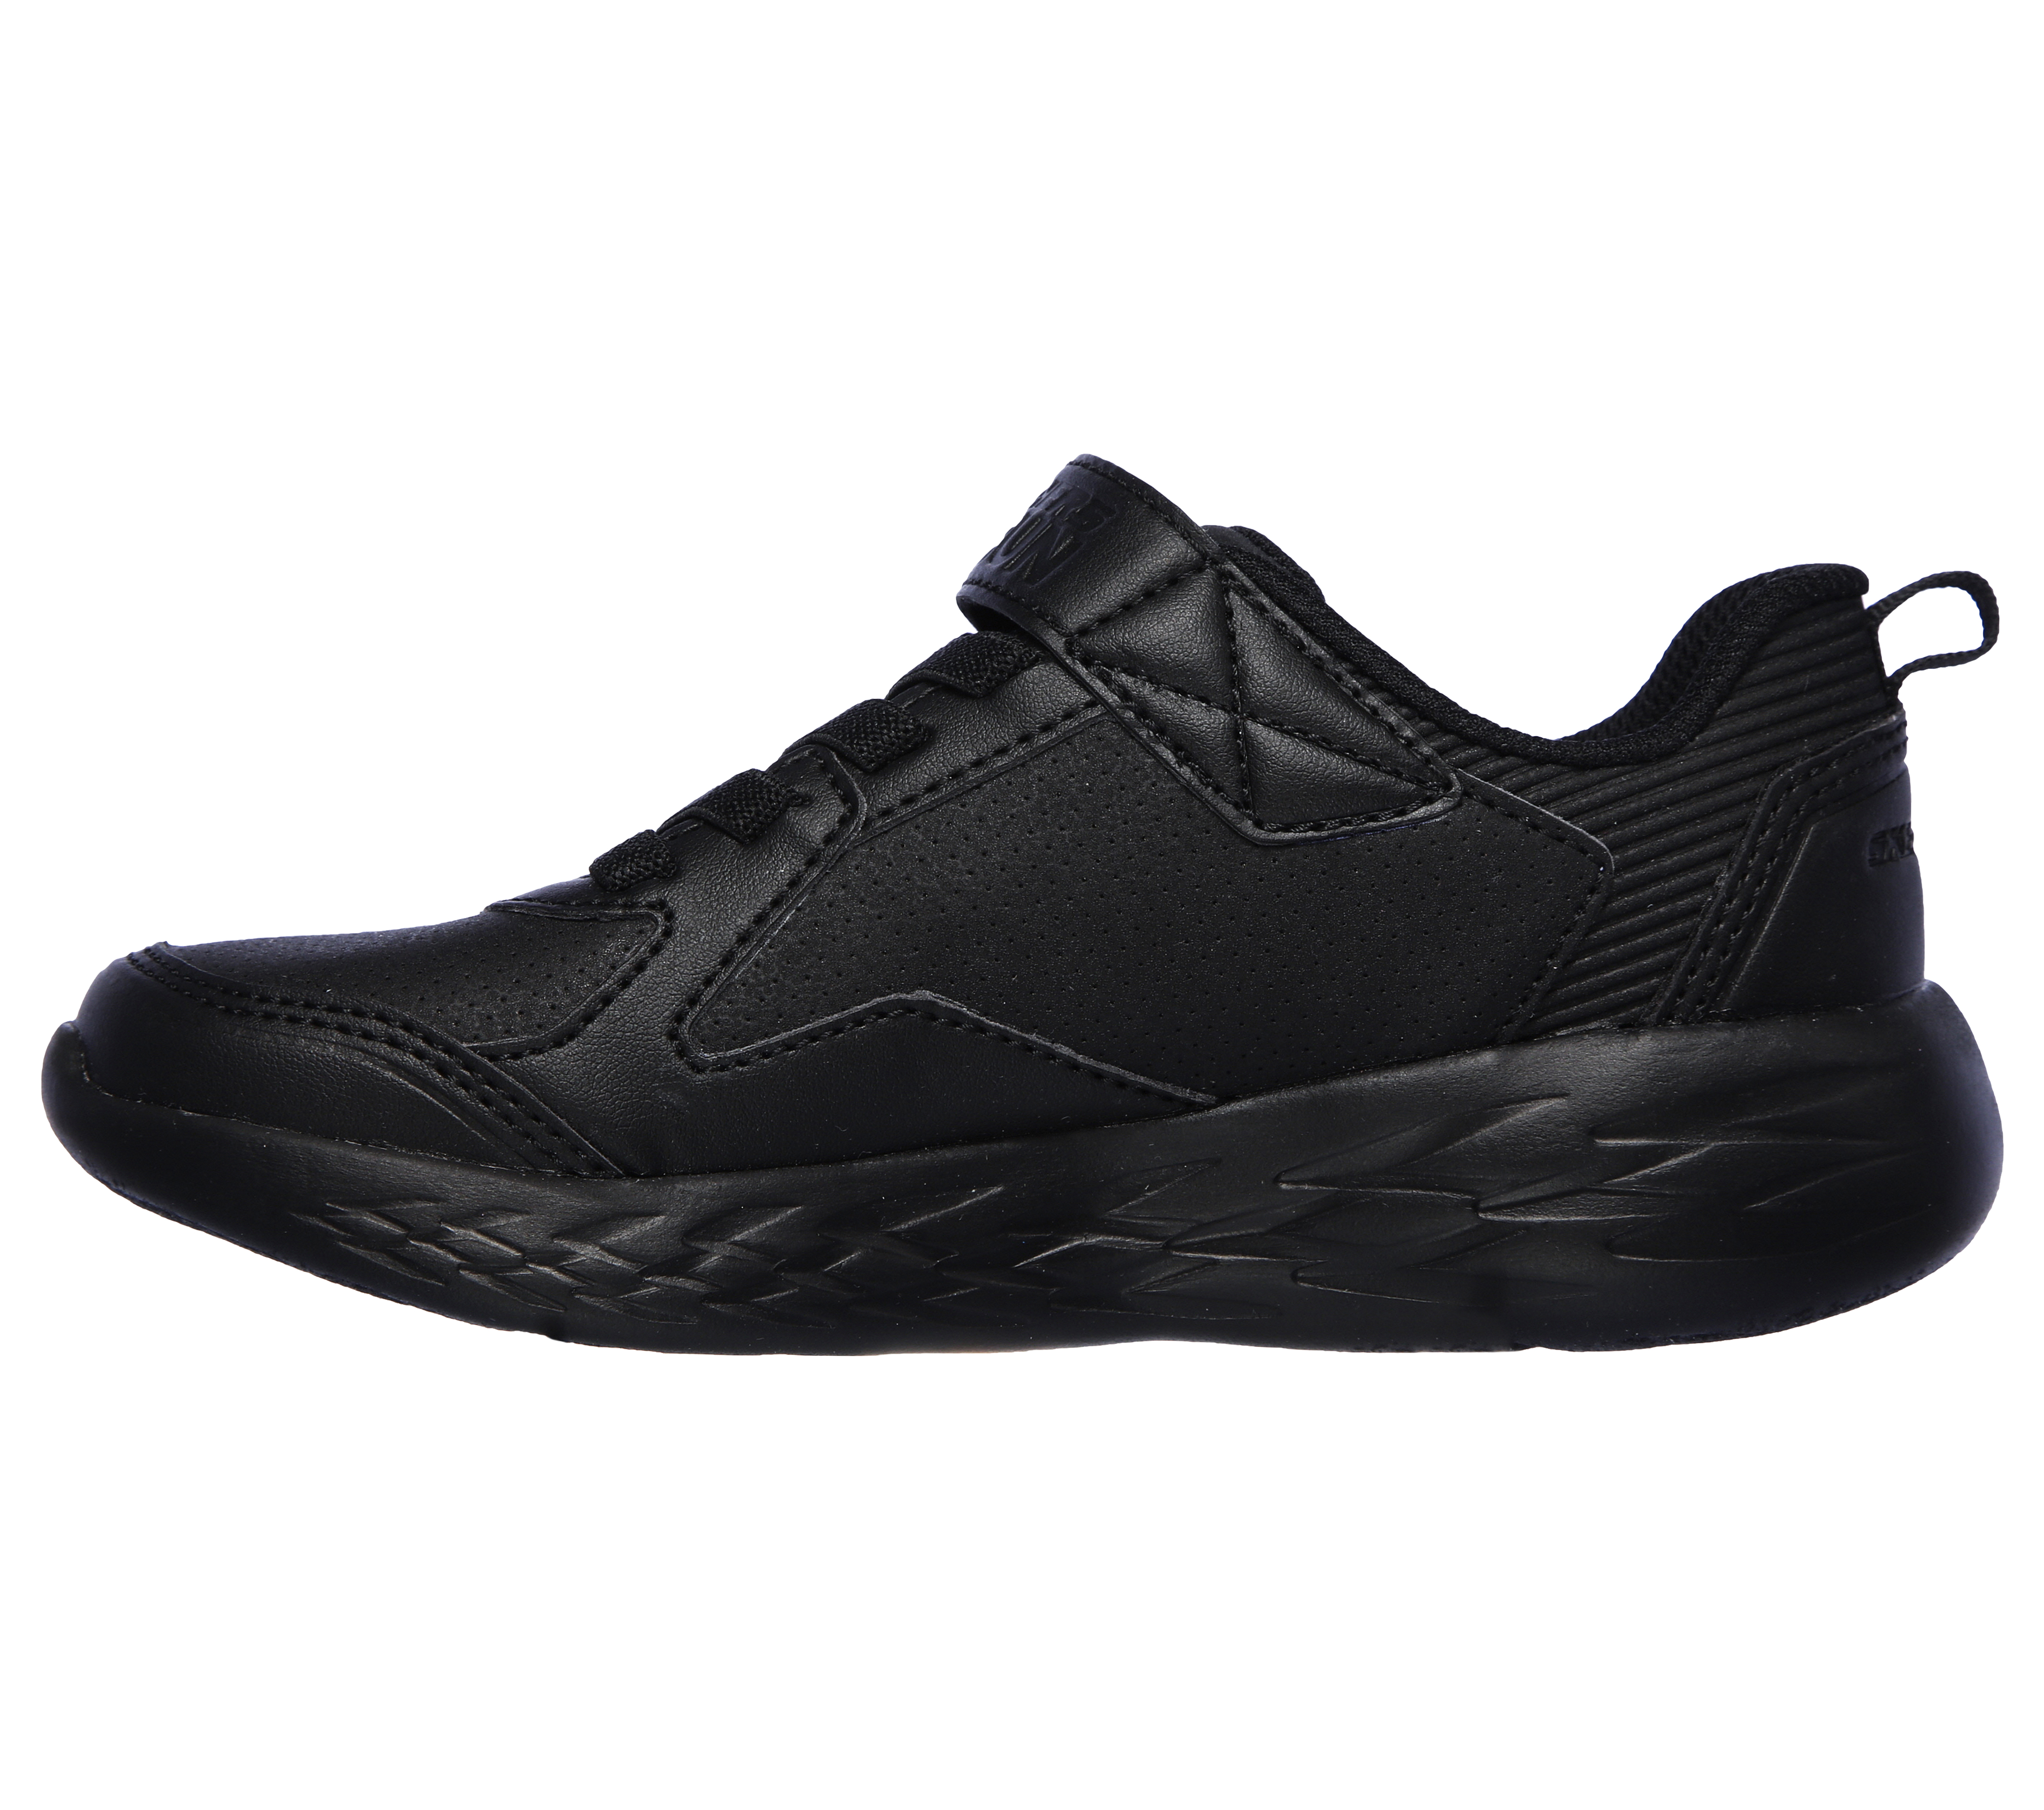 skechers кроссовки для девочек skechers go run 600 sparkle speed размер 38 Кроссовки Skechers Go Run 600-Zexor Kid's Sport Shoes